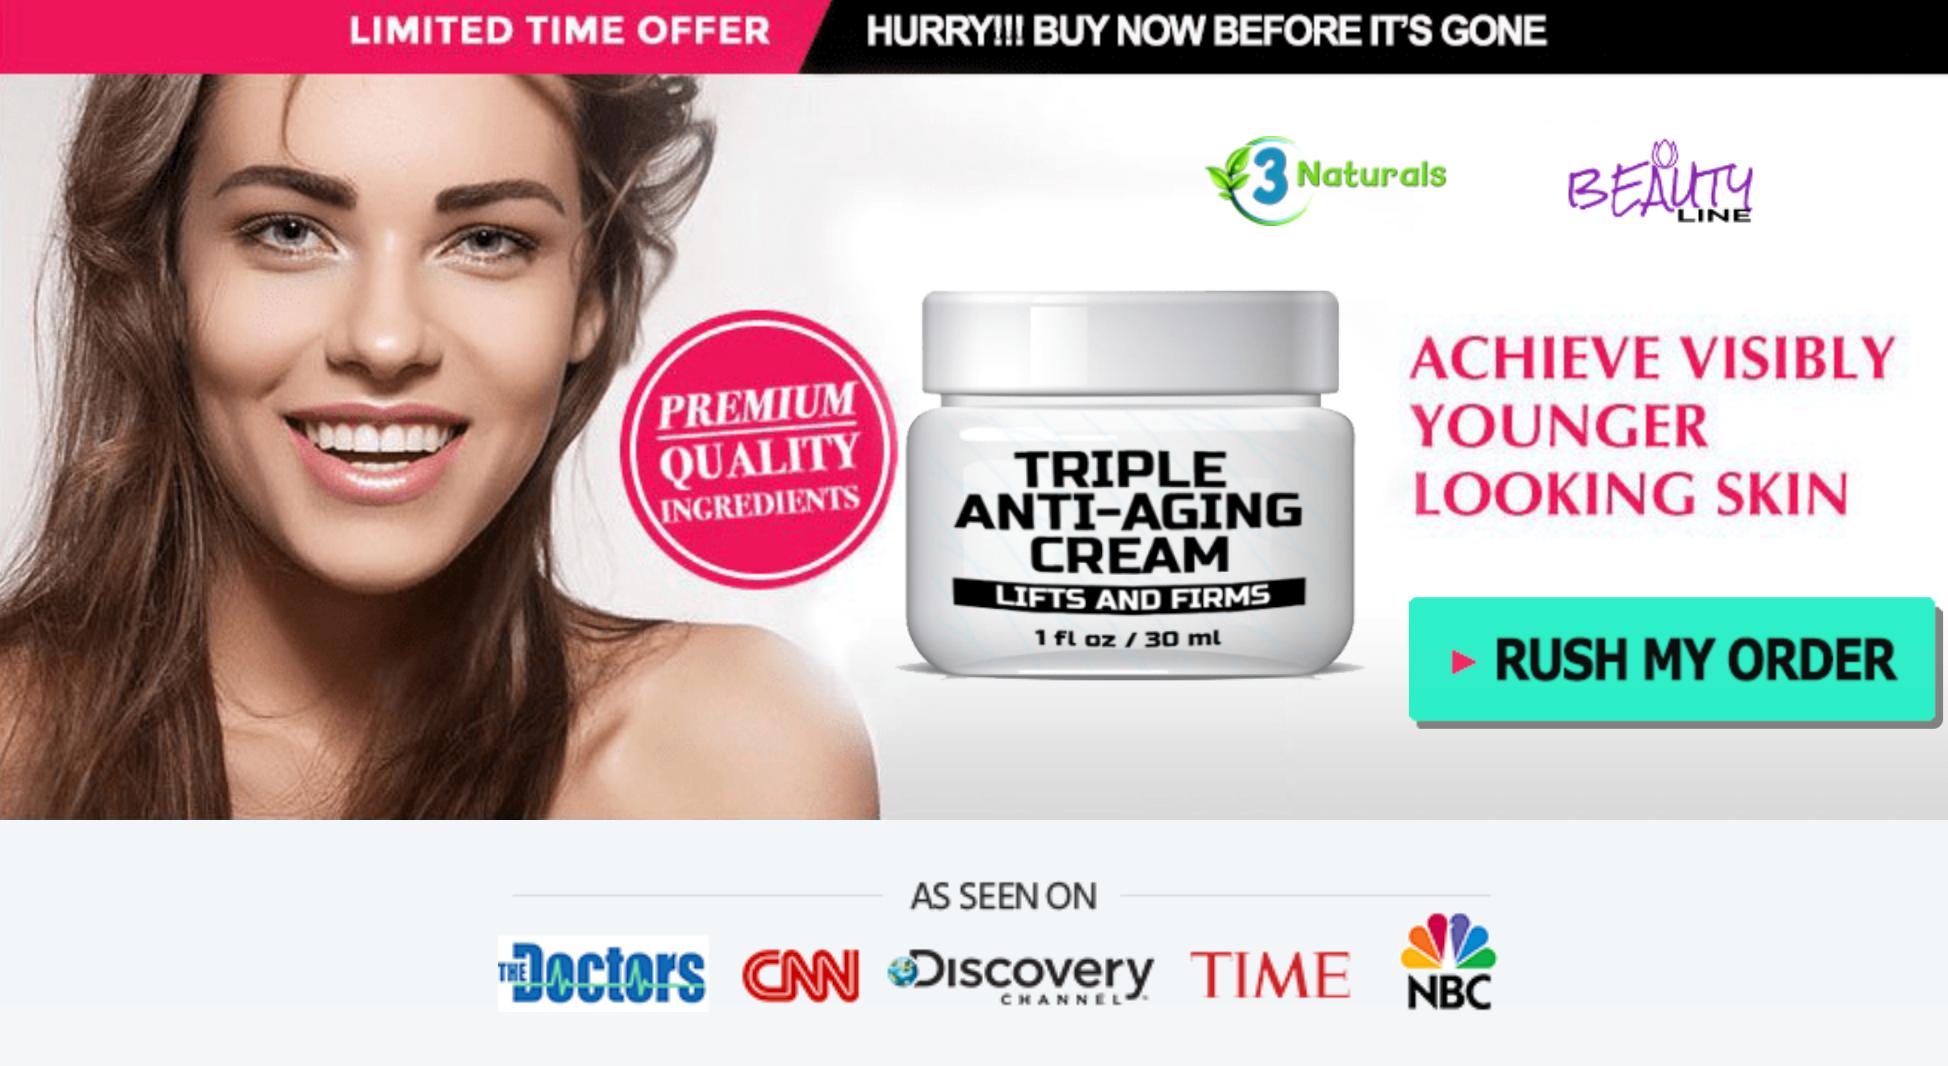 Triple Anti-Aging Cream